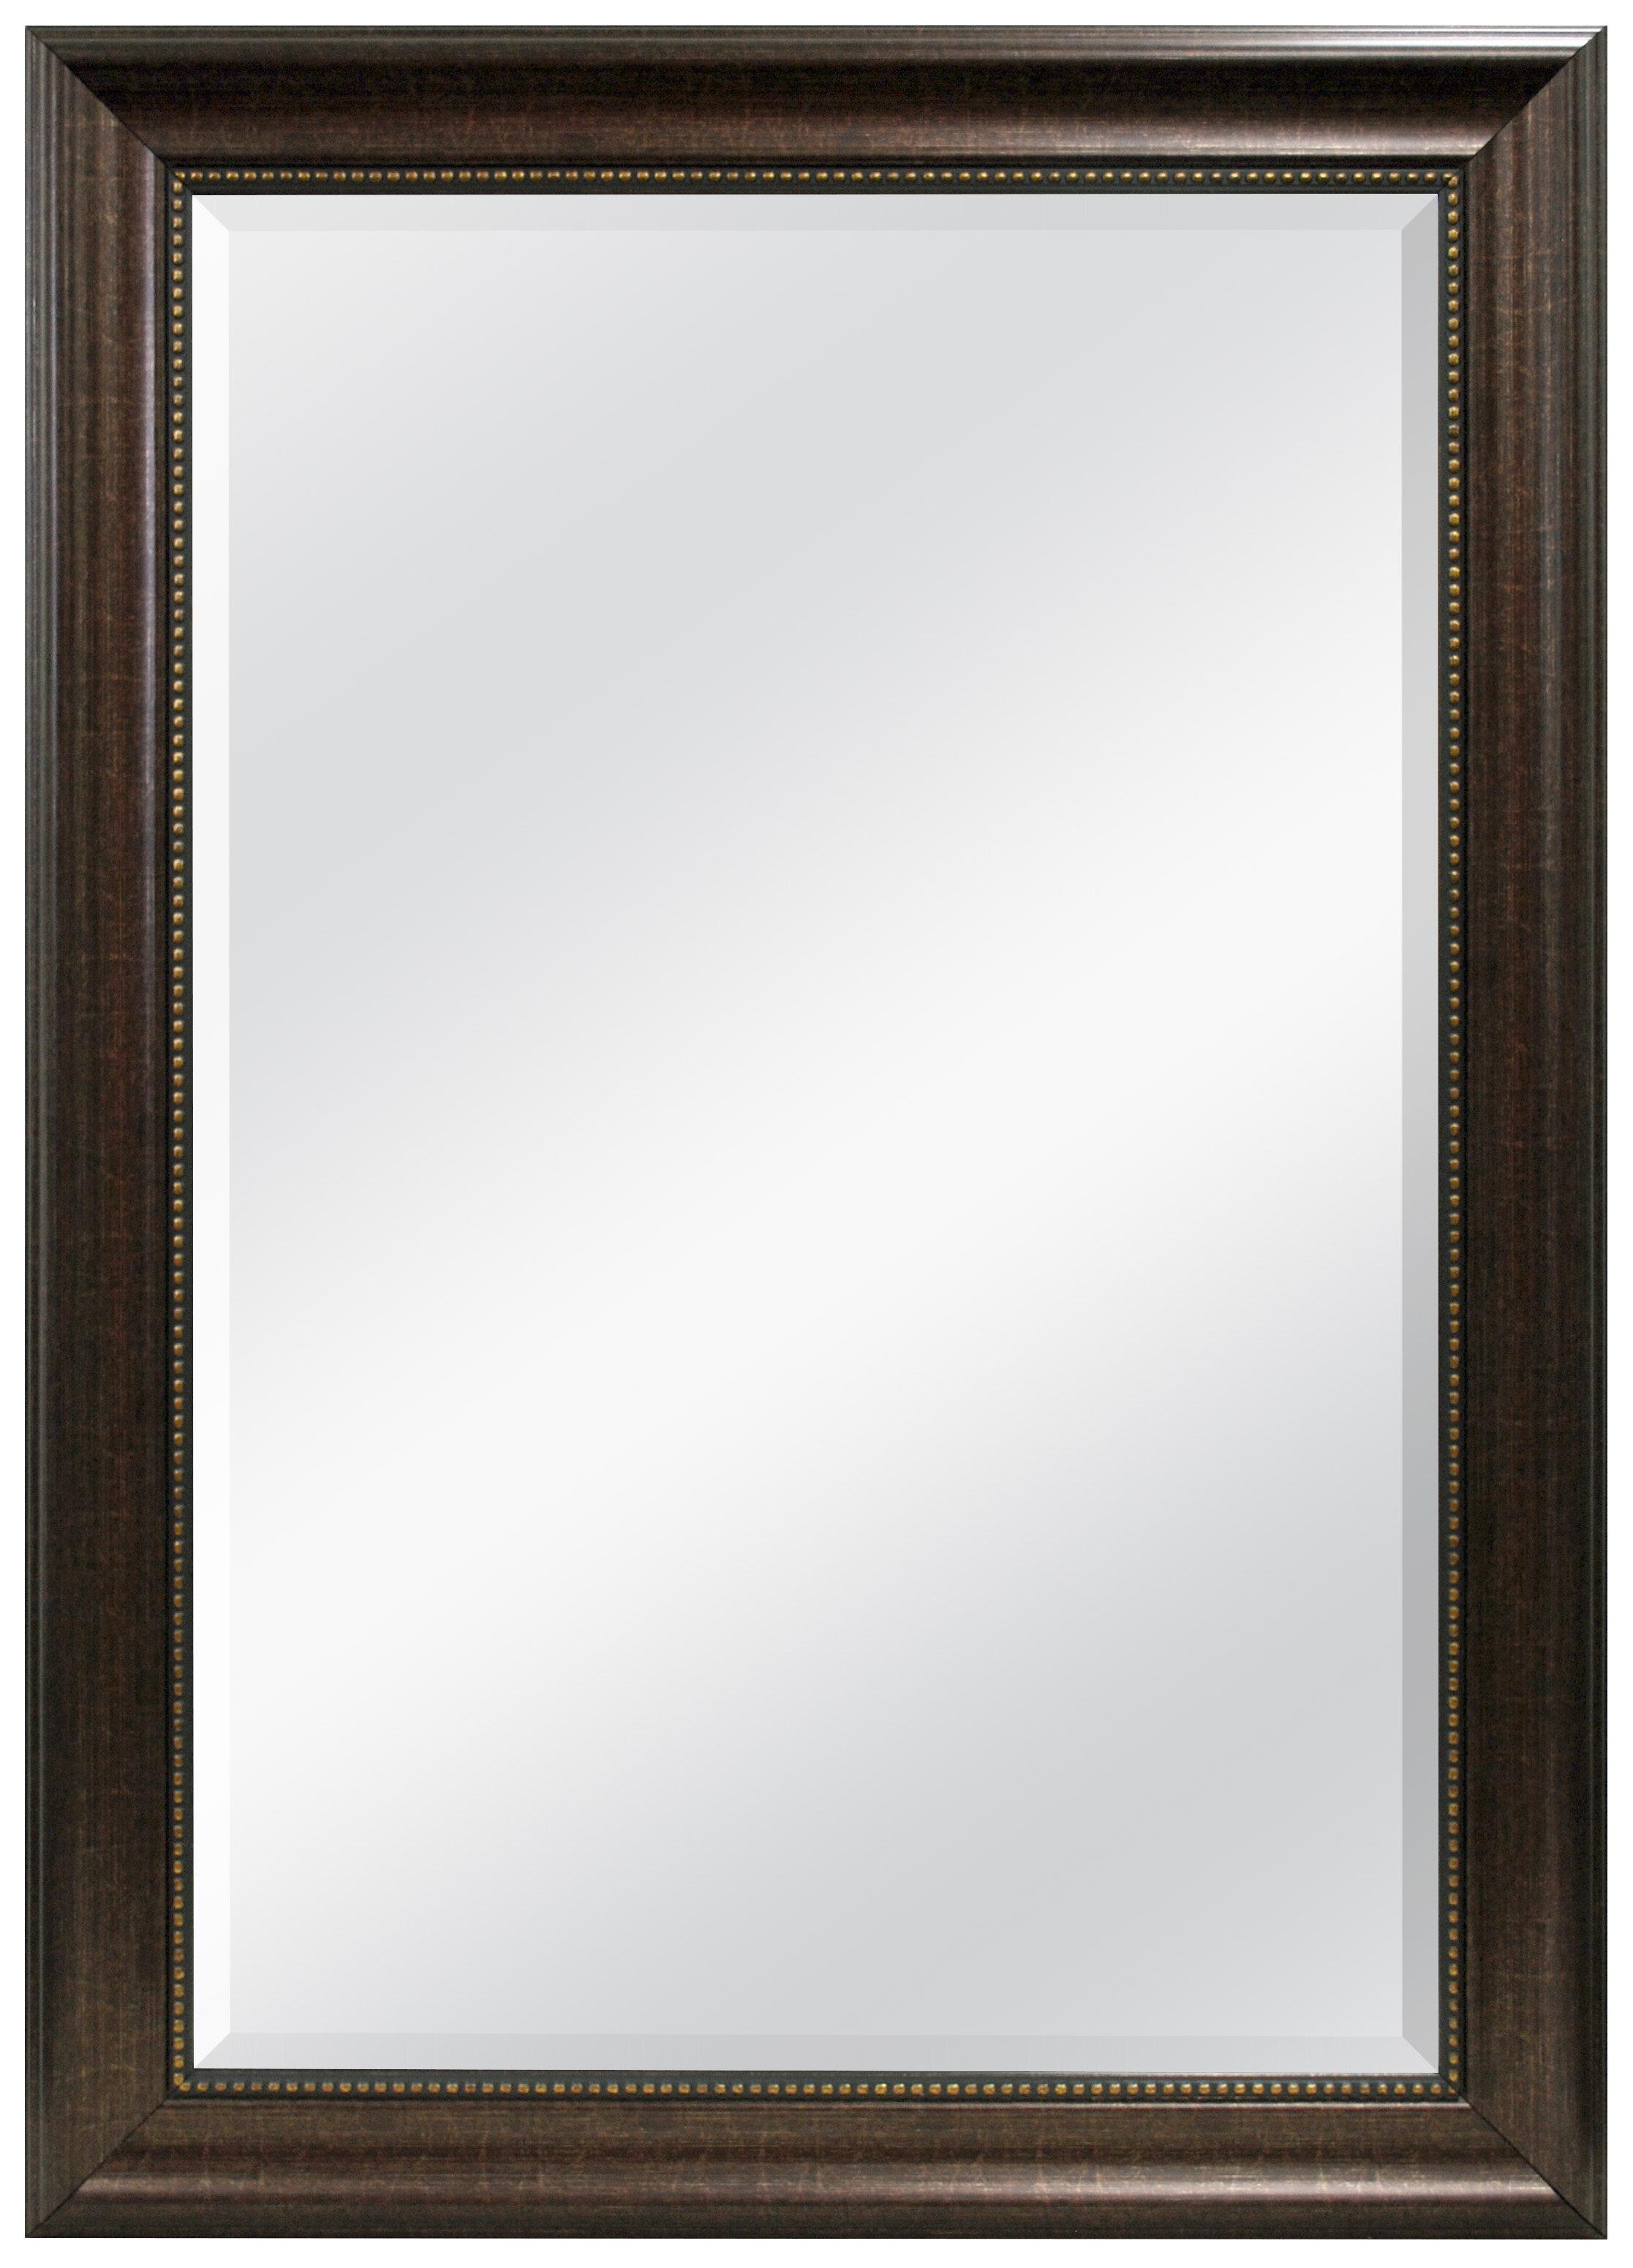 Vassallo Beaded Bronze Beveled Wall Mirror